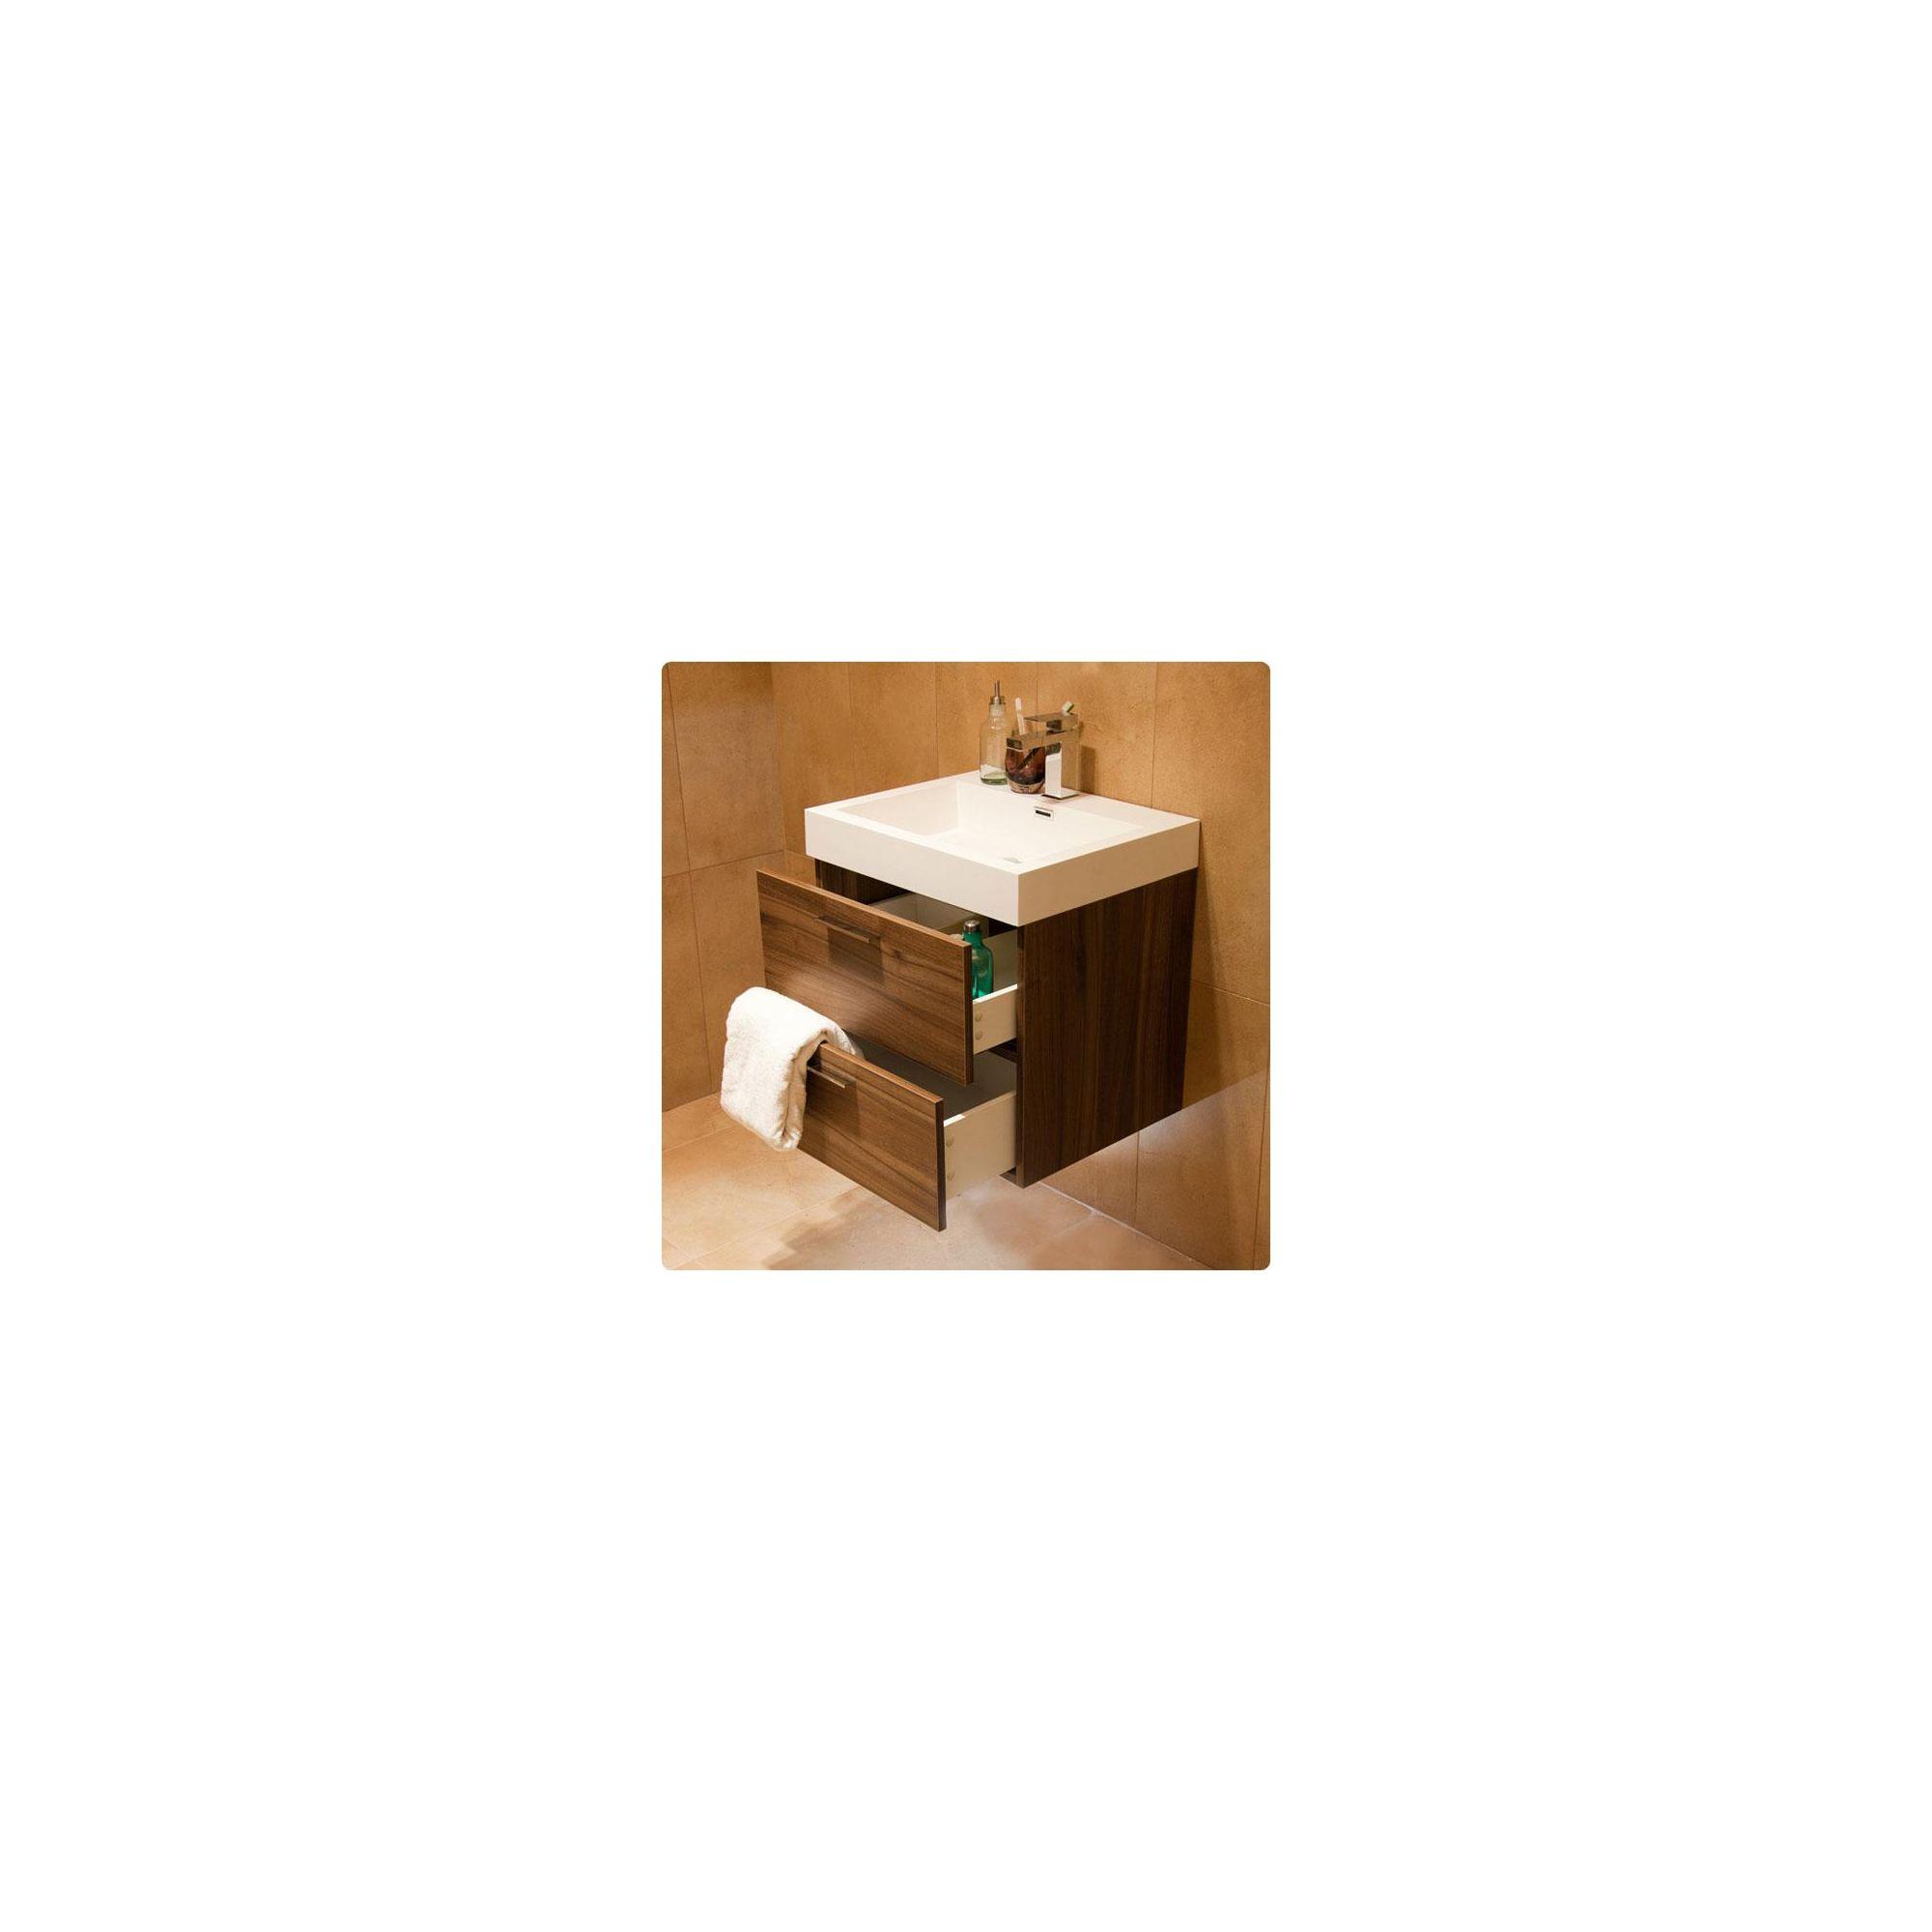 Durab Evolution Bathroom WALNUT Vanity Unit (Wall Mounted) including Basin 580mm Wide x 468mm Deep